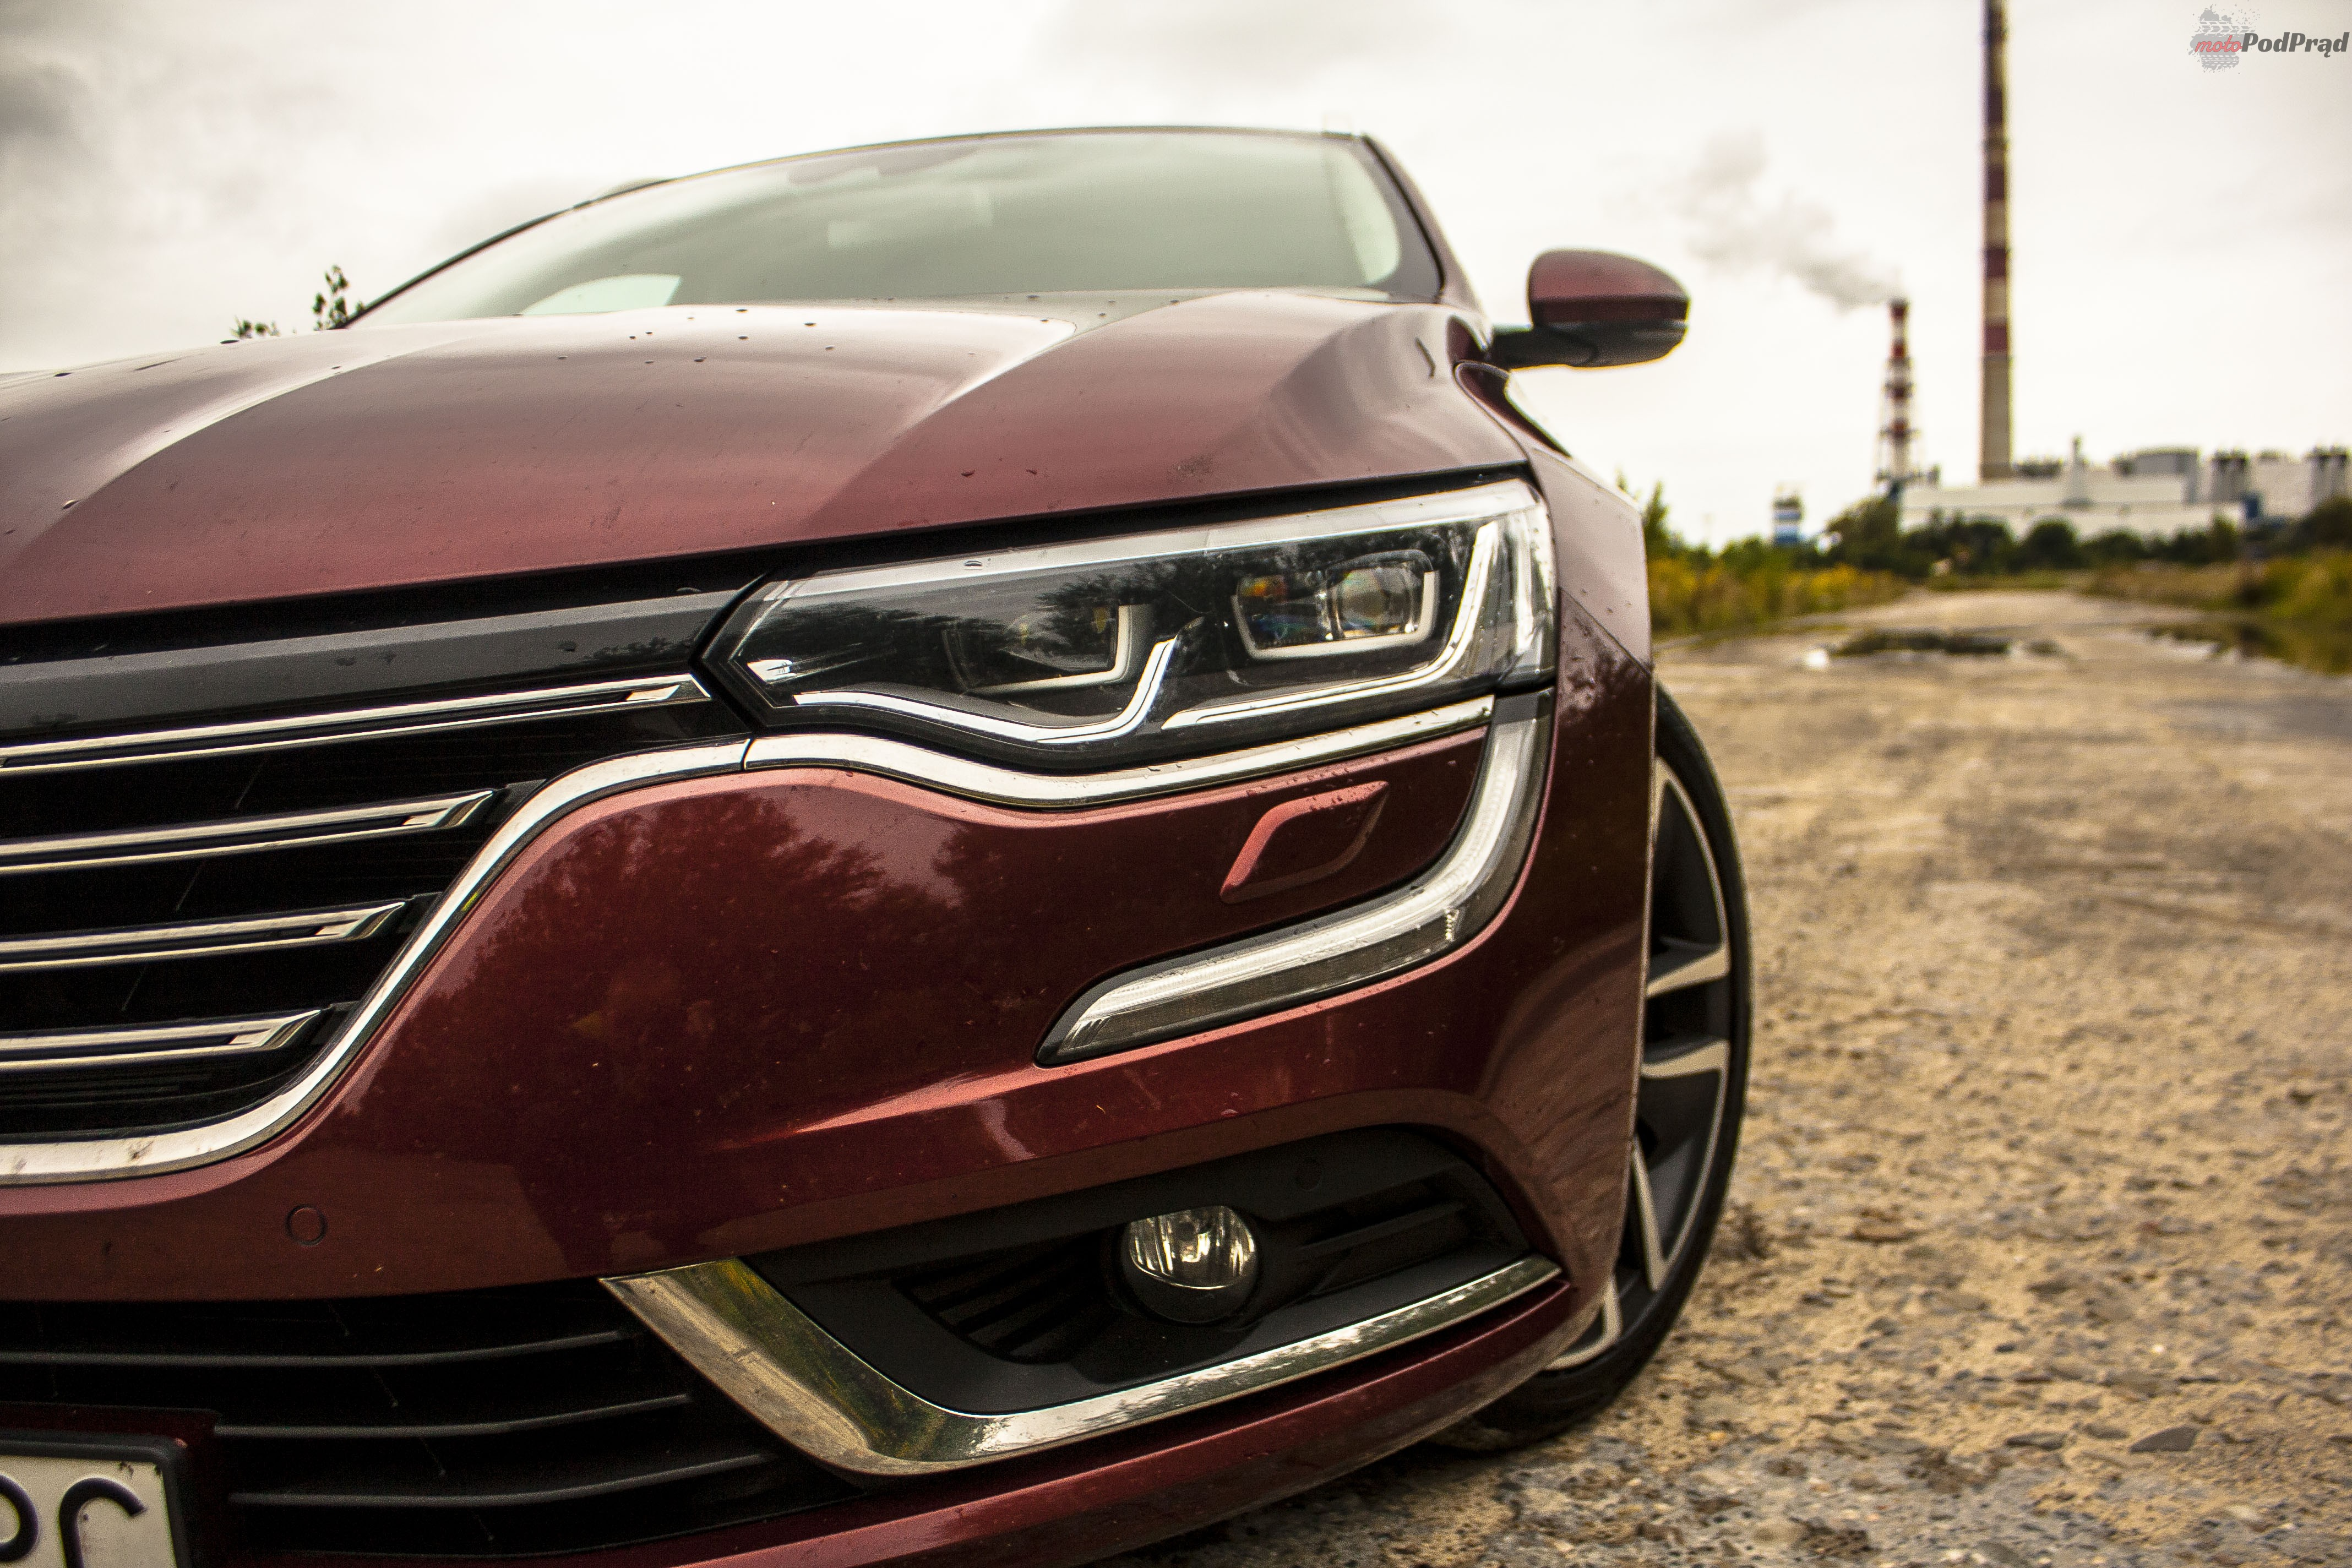 Renault Talisman 3 Test: Renault Talisman Grandtour 1.6 dCi 130 KM   kompan w podróży